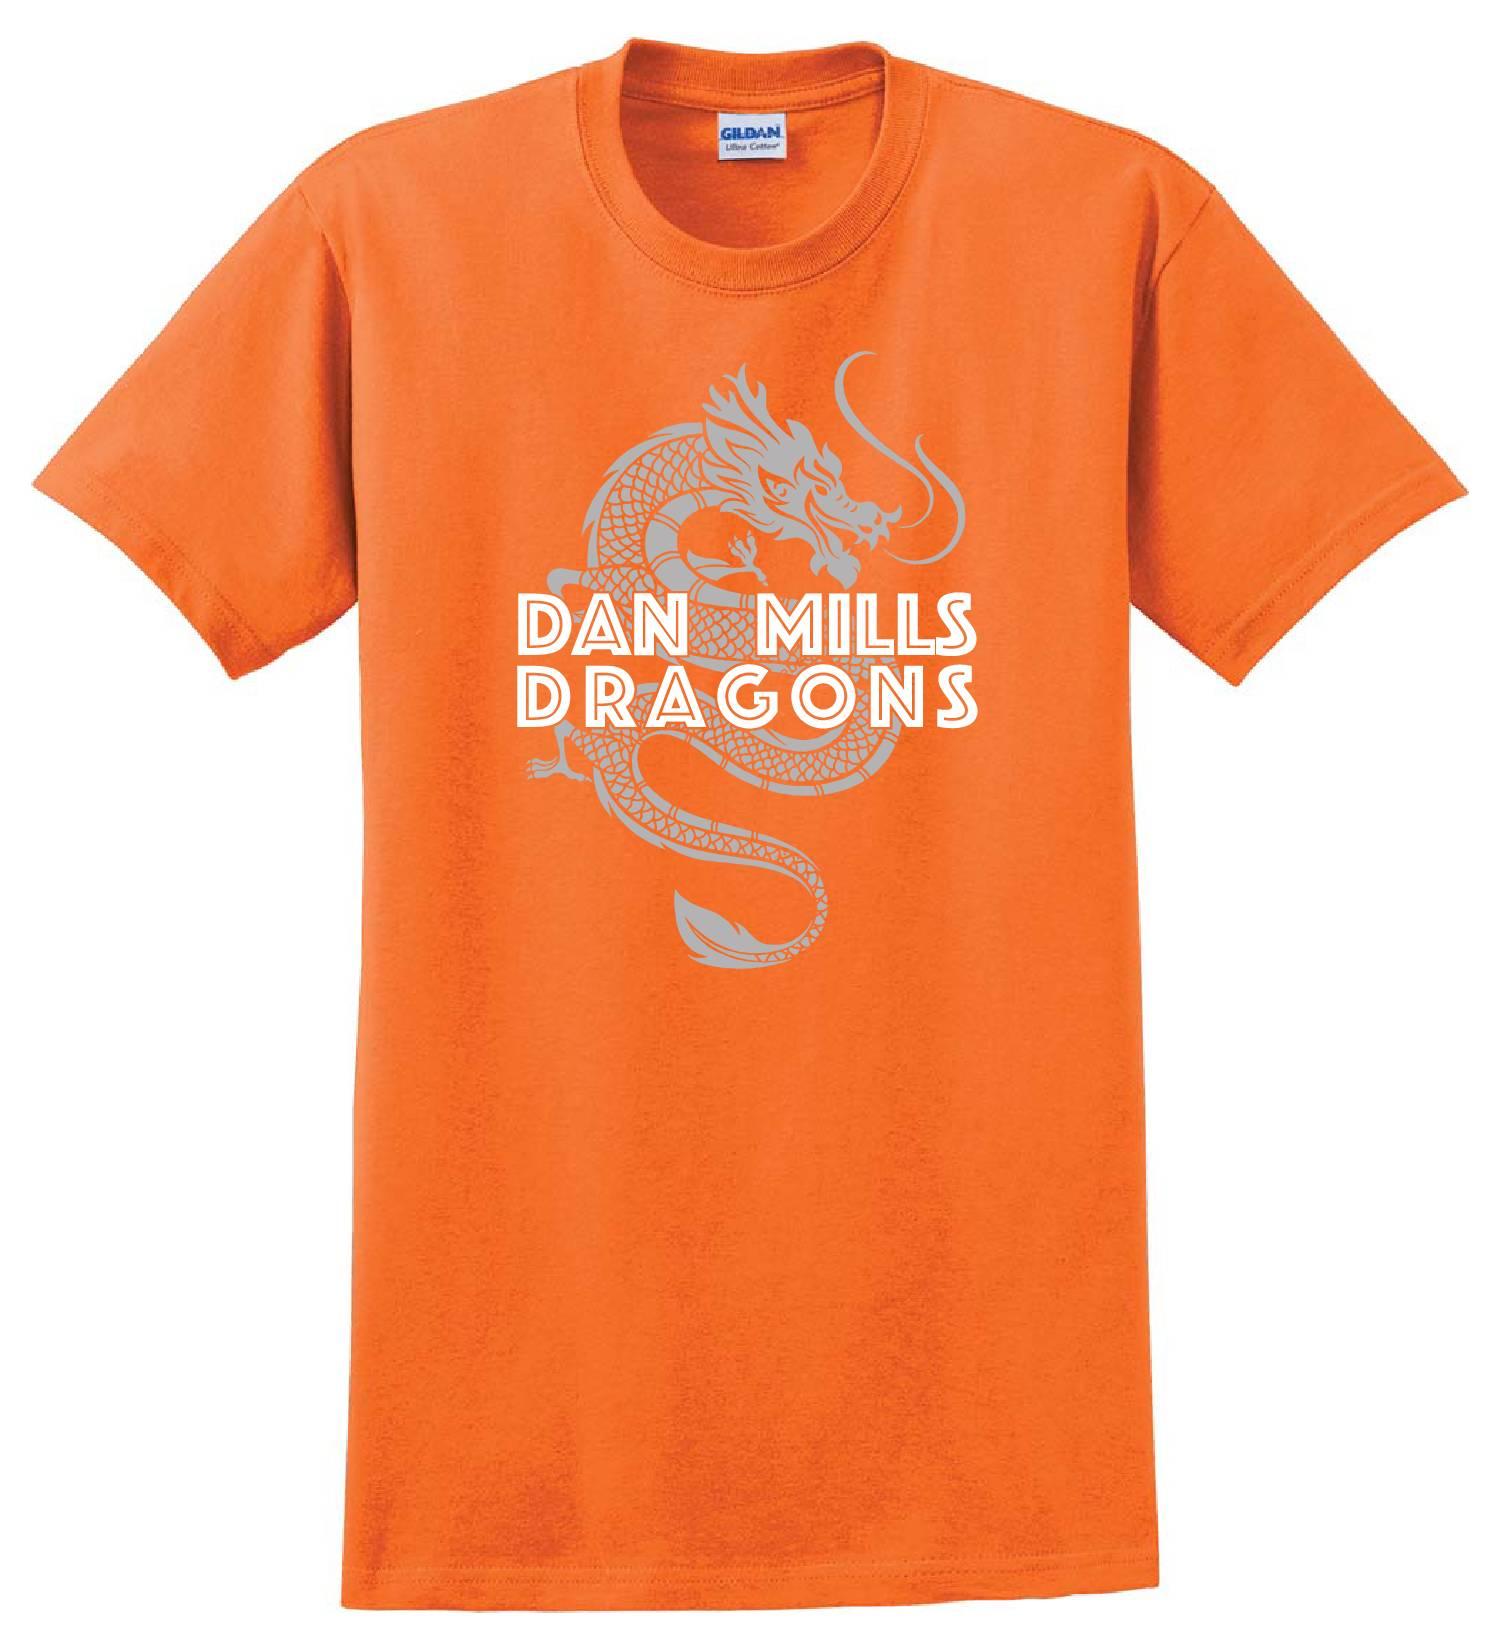 Proofs Dan Mills Dragons ff-3.jpg